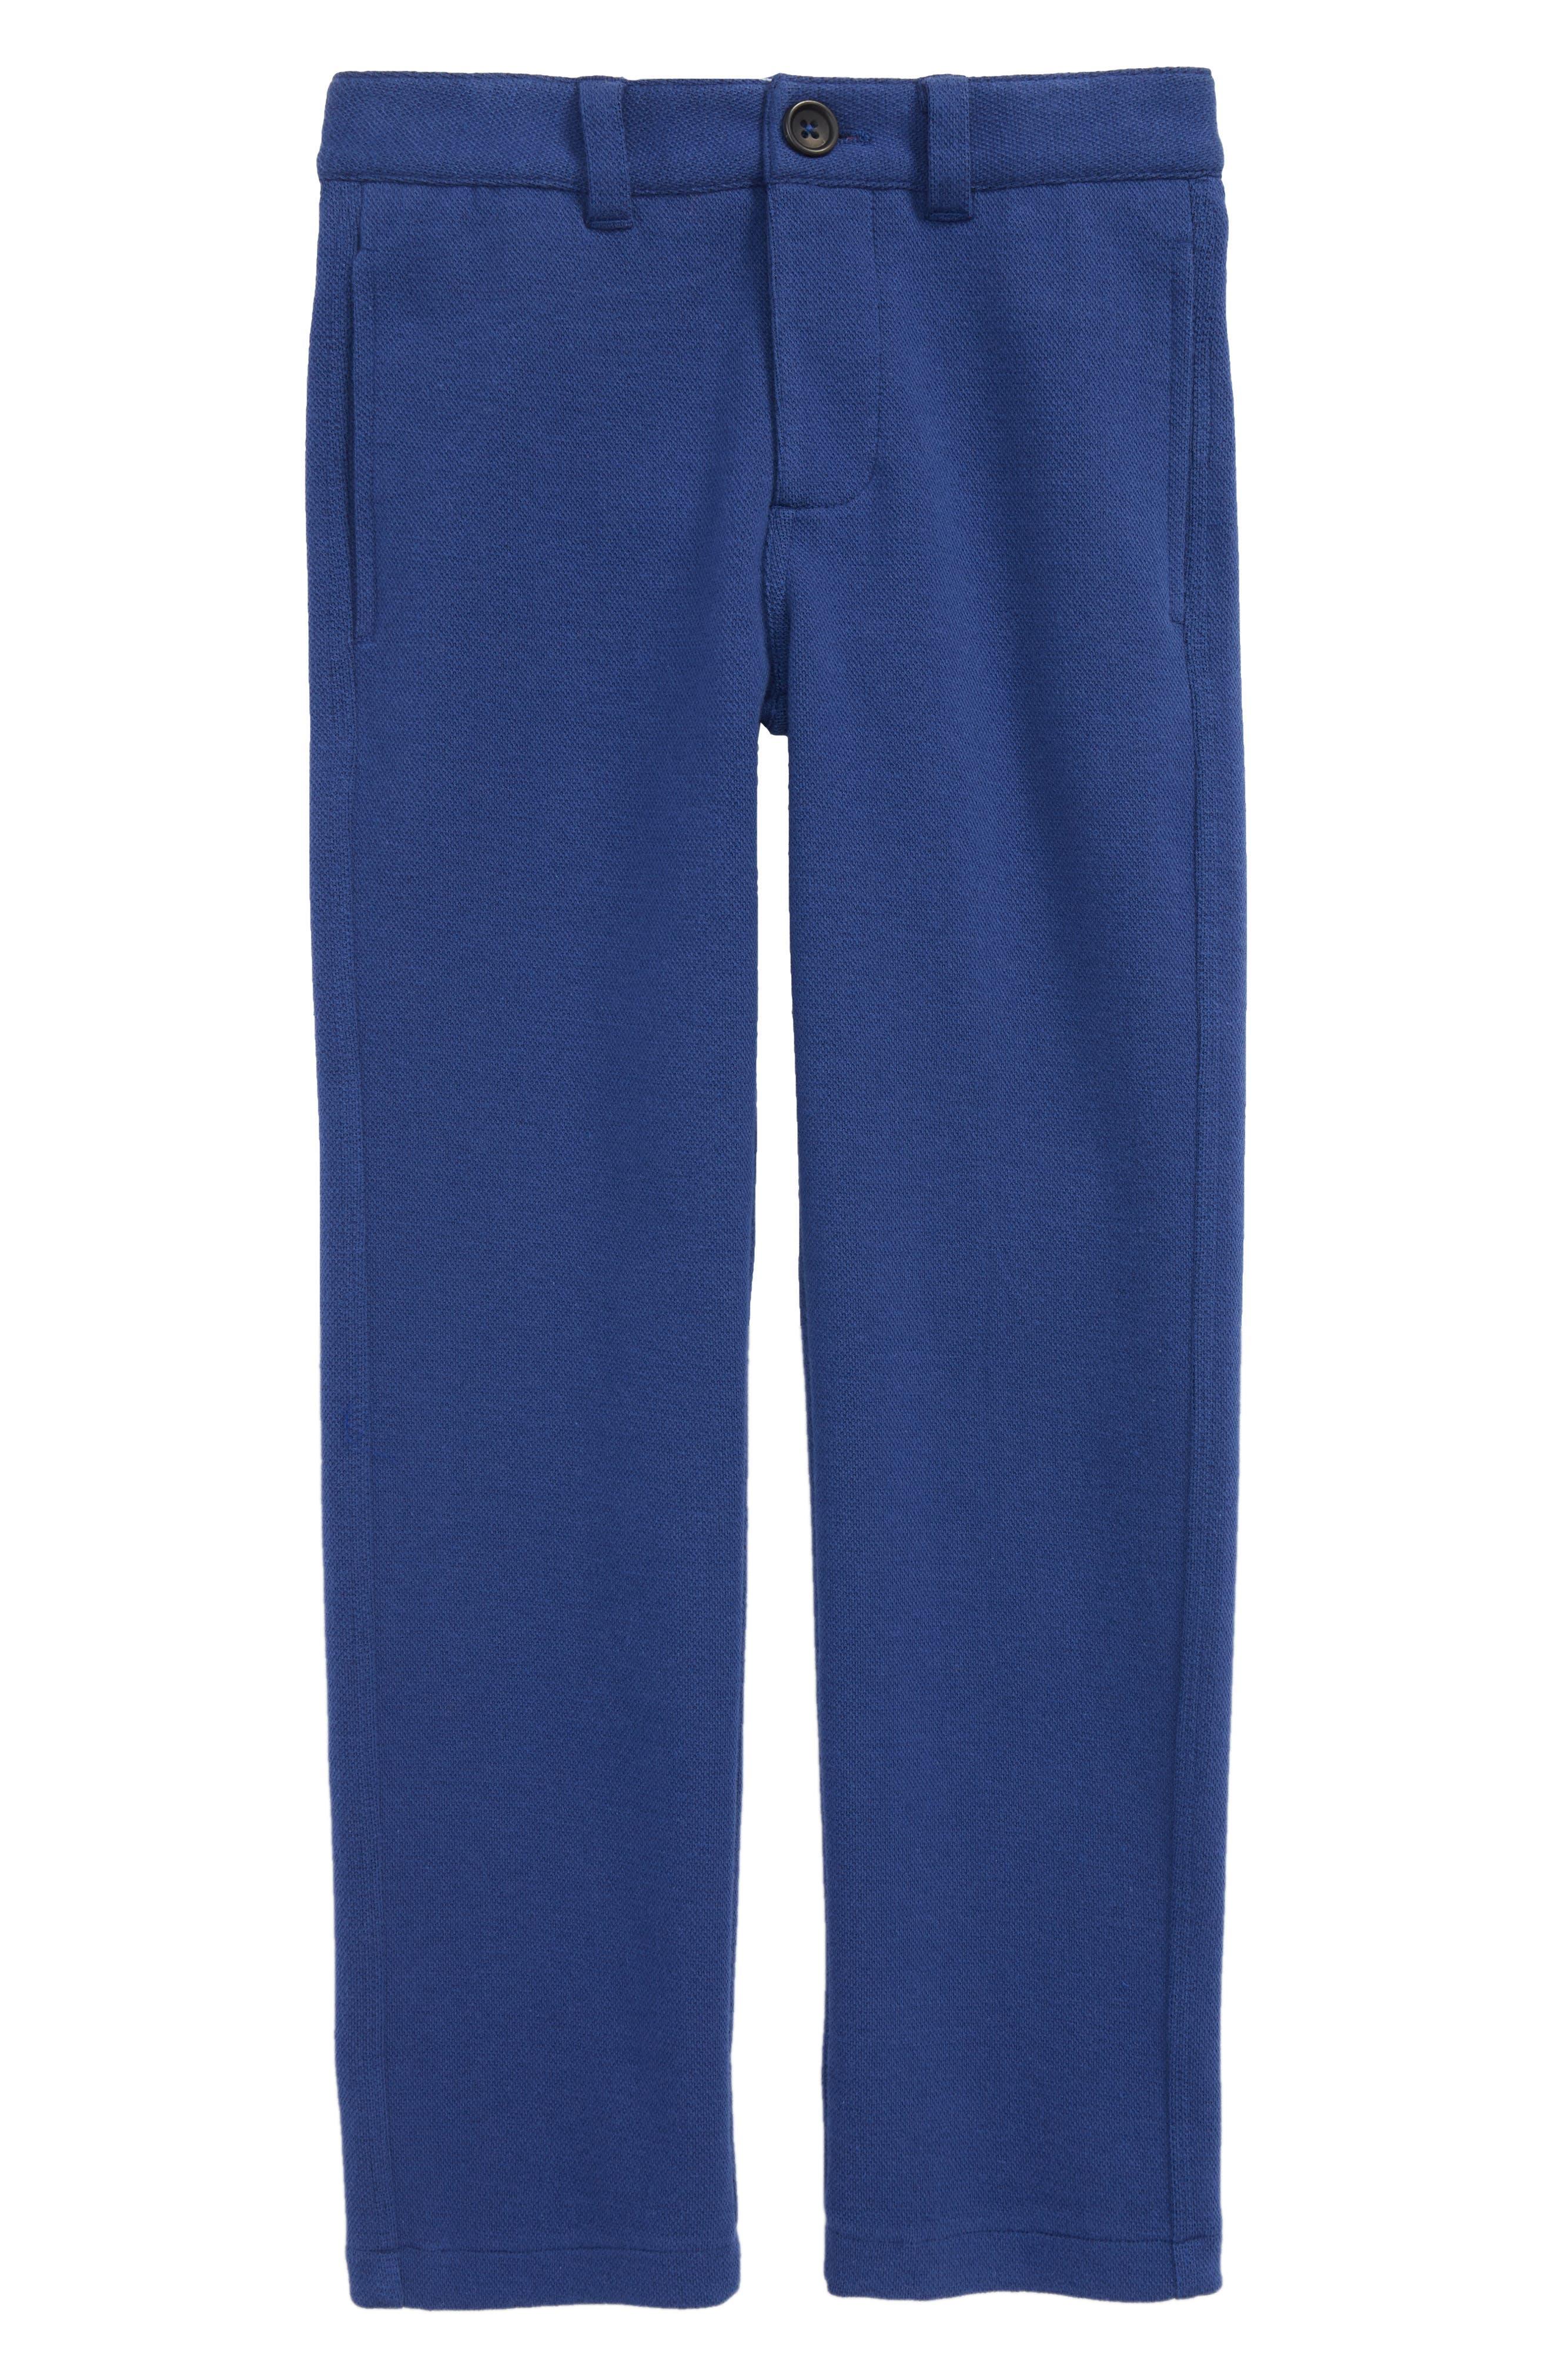 Main Image - Mini Boden Jersey Chino Pants (Toddler Boys, Little Boys & Big Boys)